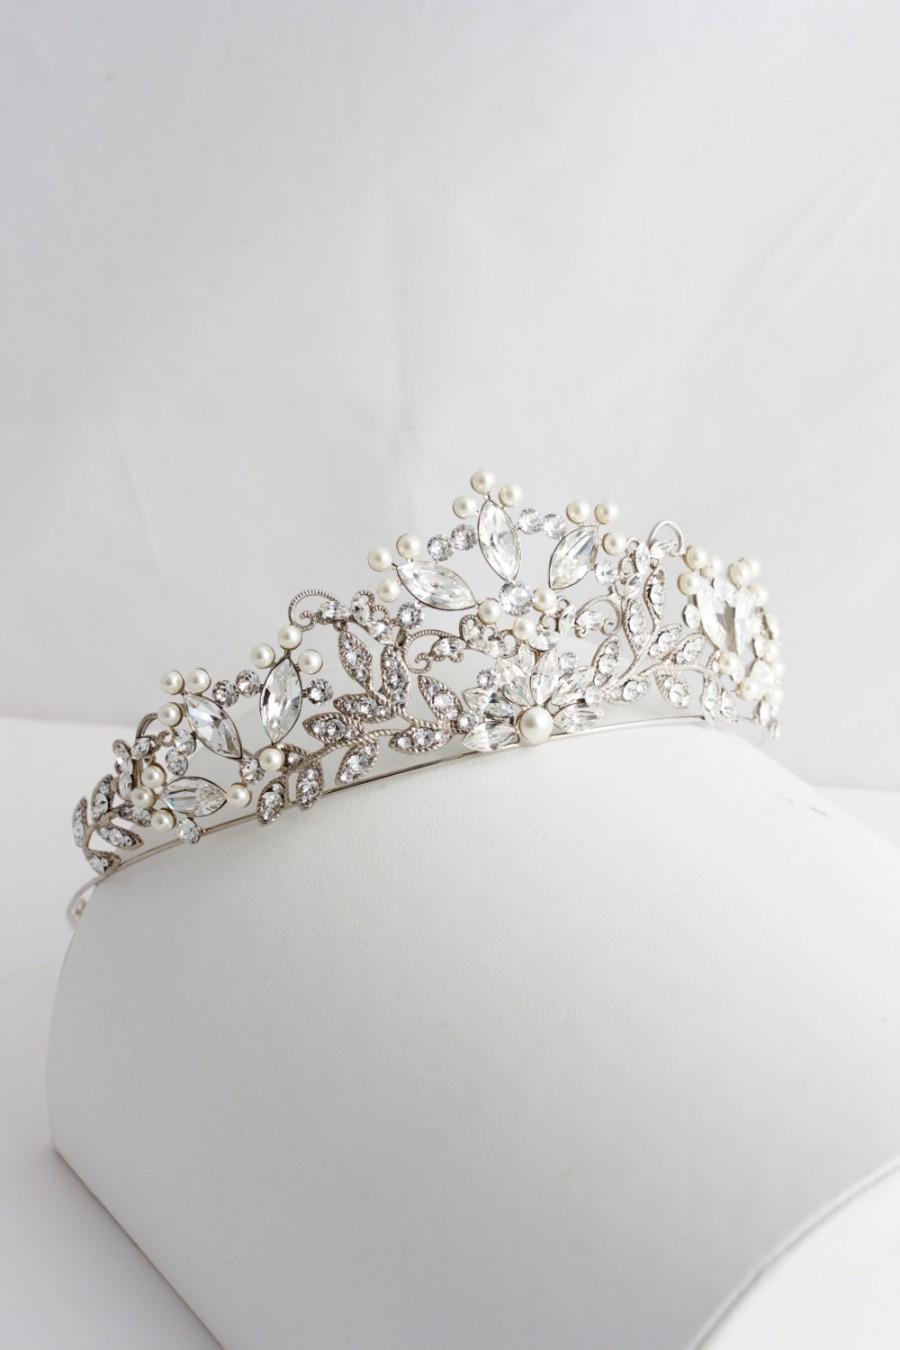 4c23c7edb99ac5 Wedding Tiara Handmade Bridal Crown Pearl Crystal Wedding Tiara Swarovski  Crystal Crown Tiara Wedding Bridal Tiara Rose Gold Tiara AISLINN